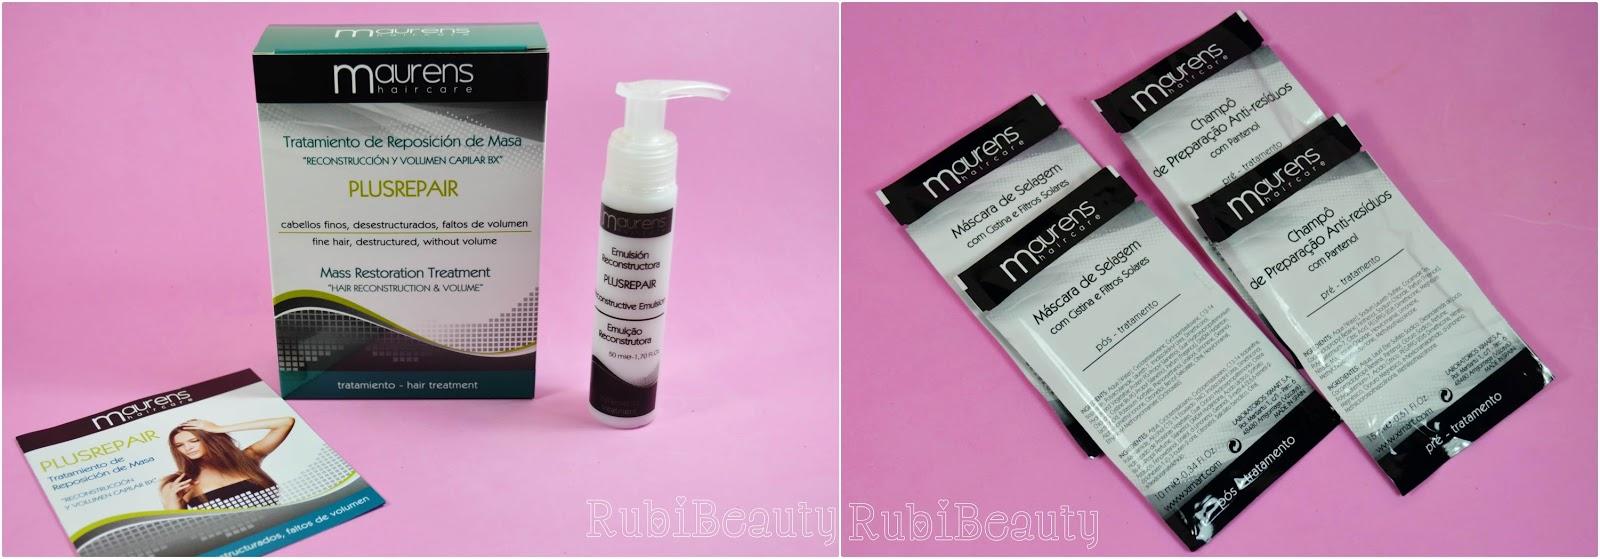 rubibeauty brasil & Belleza botox capilar volumen cabello Maurens Repositor Masa review